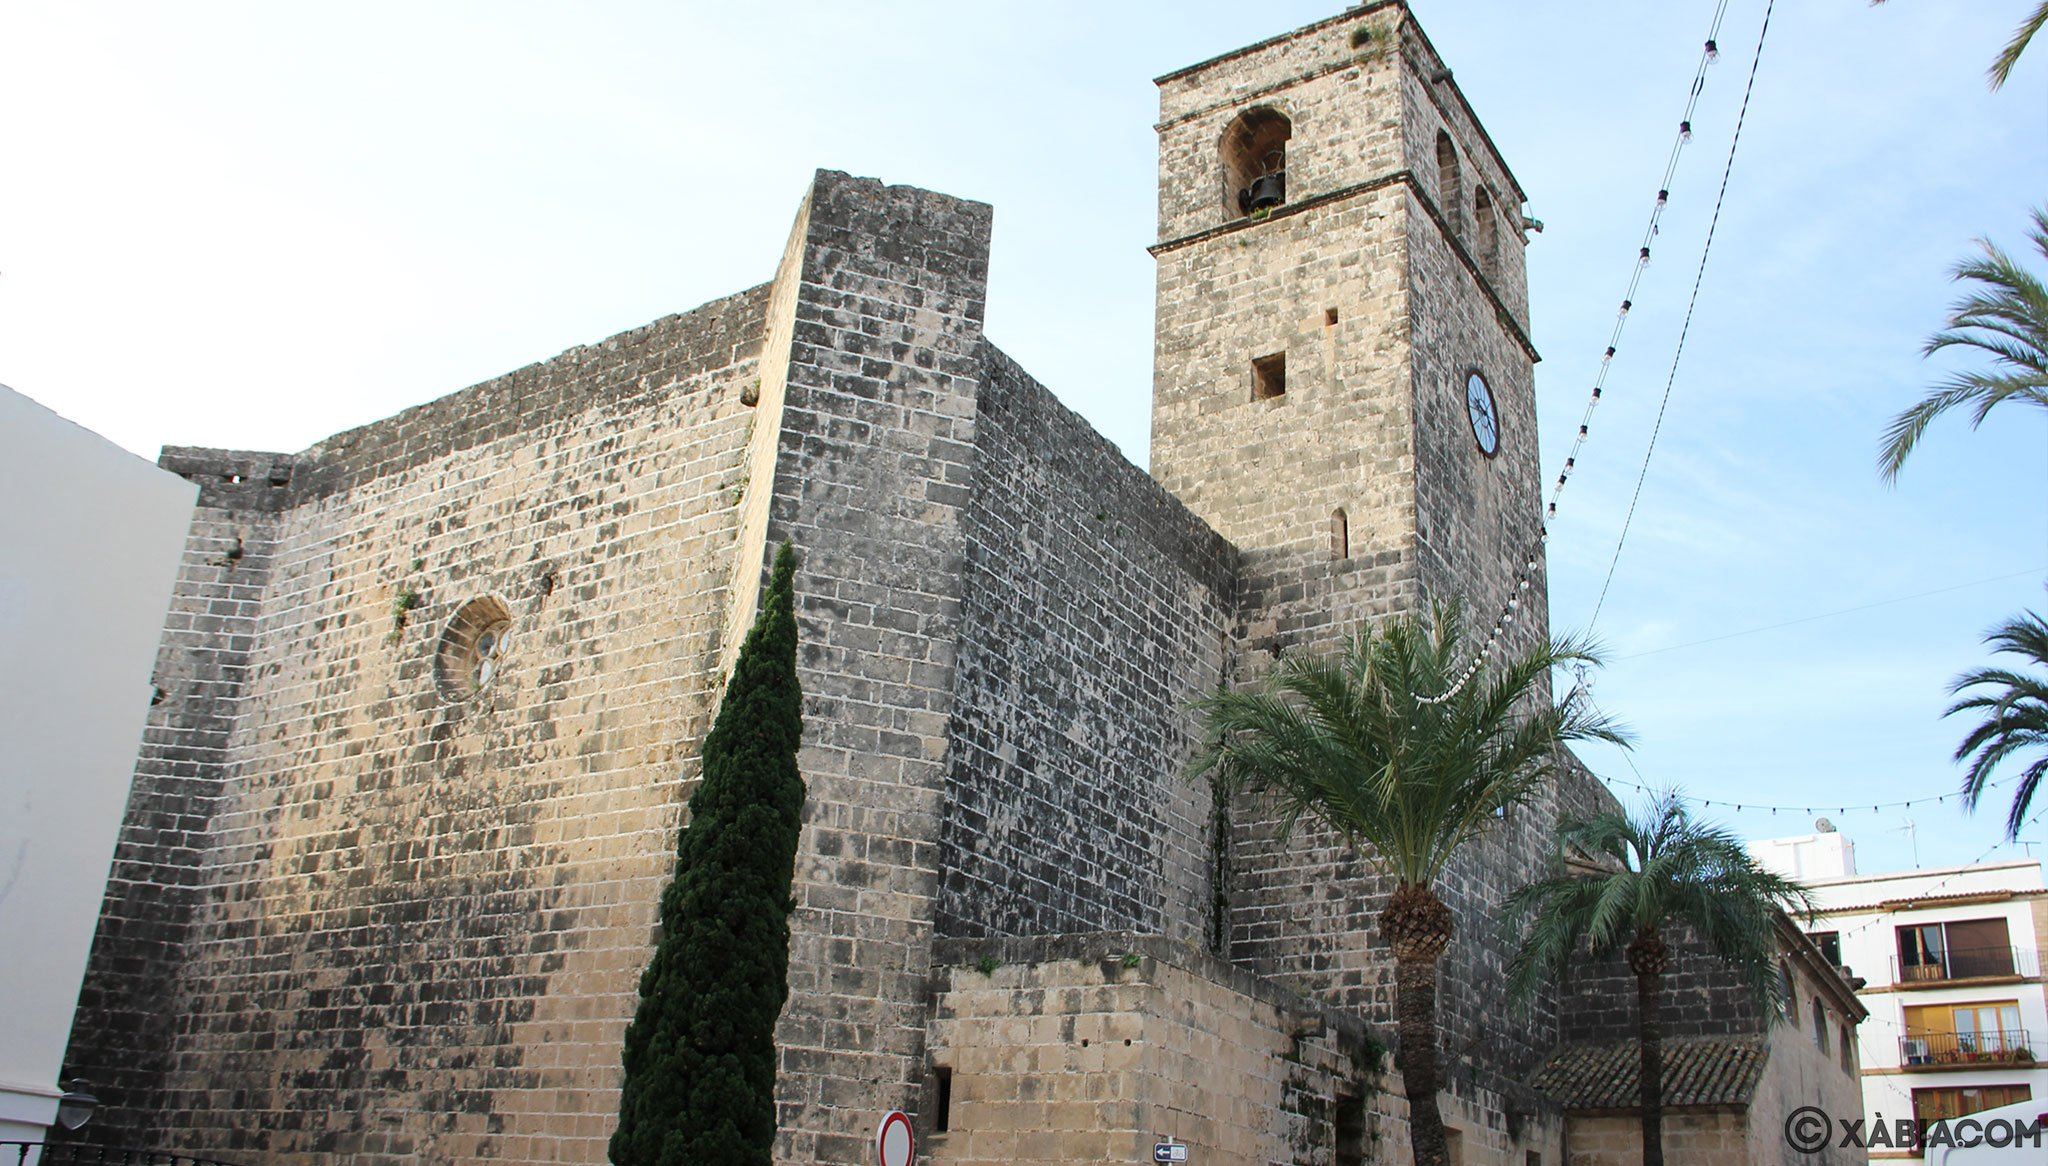 Fachada de la Iglesia de San Bartolomé de Jávea